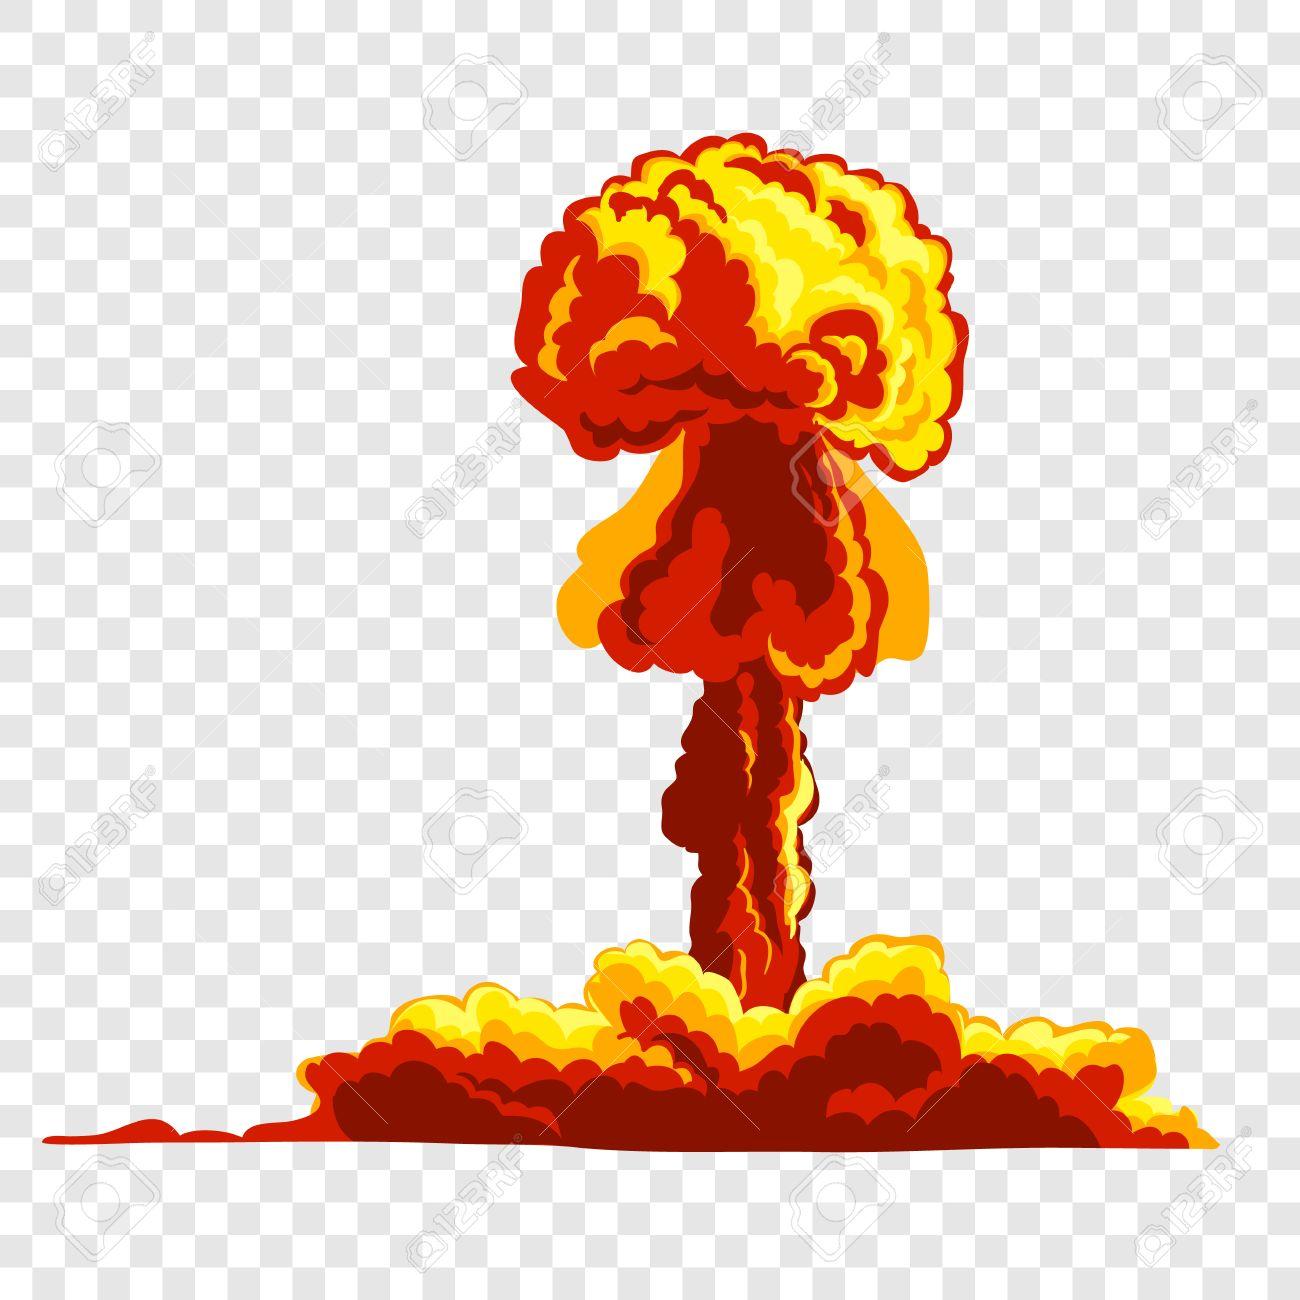 Bomb Clipart Transparent Background.